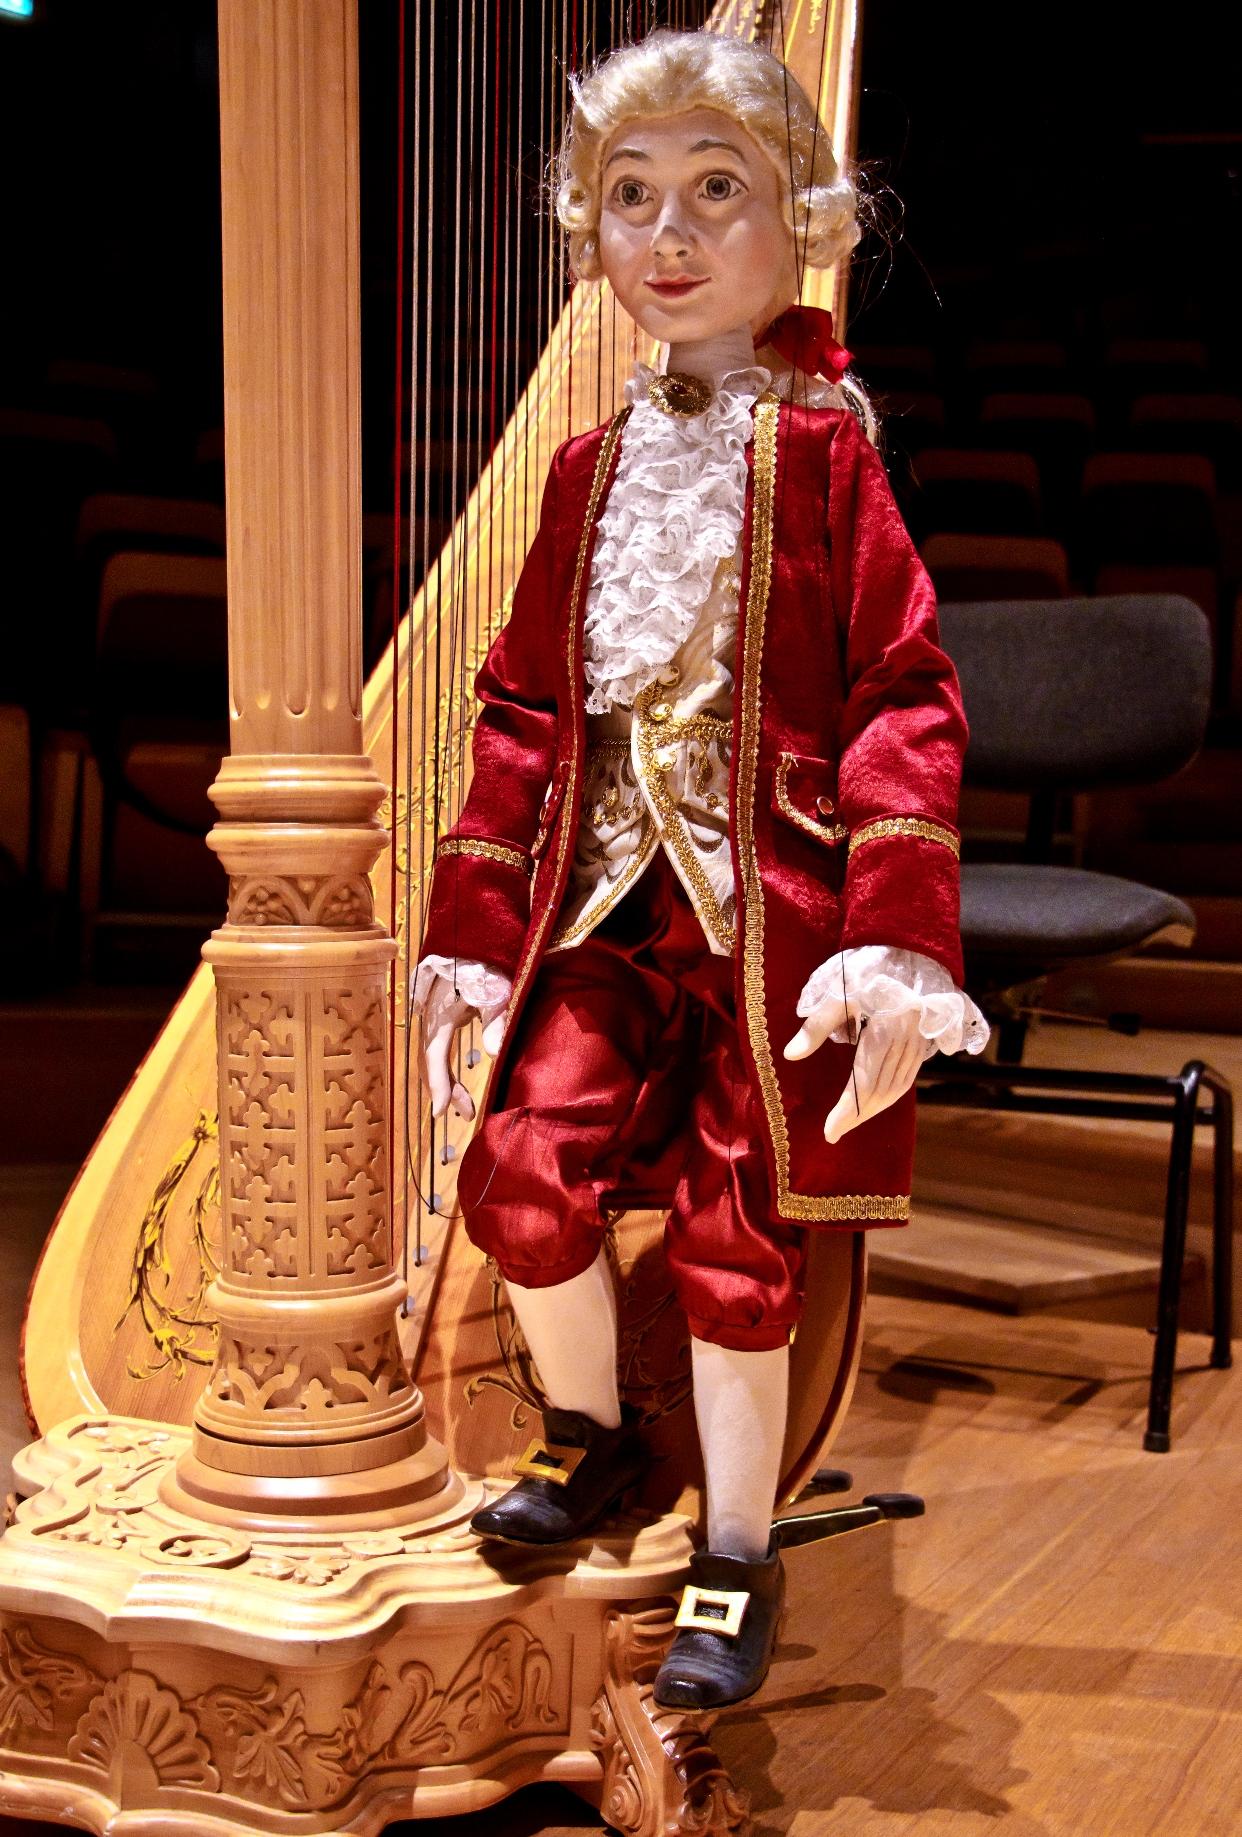 Pan Vivaldi